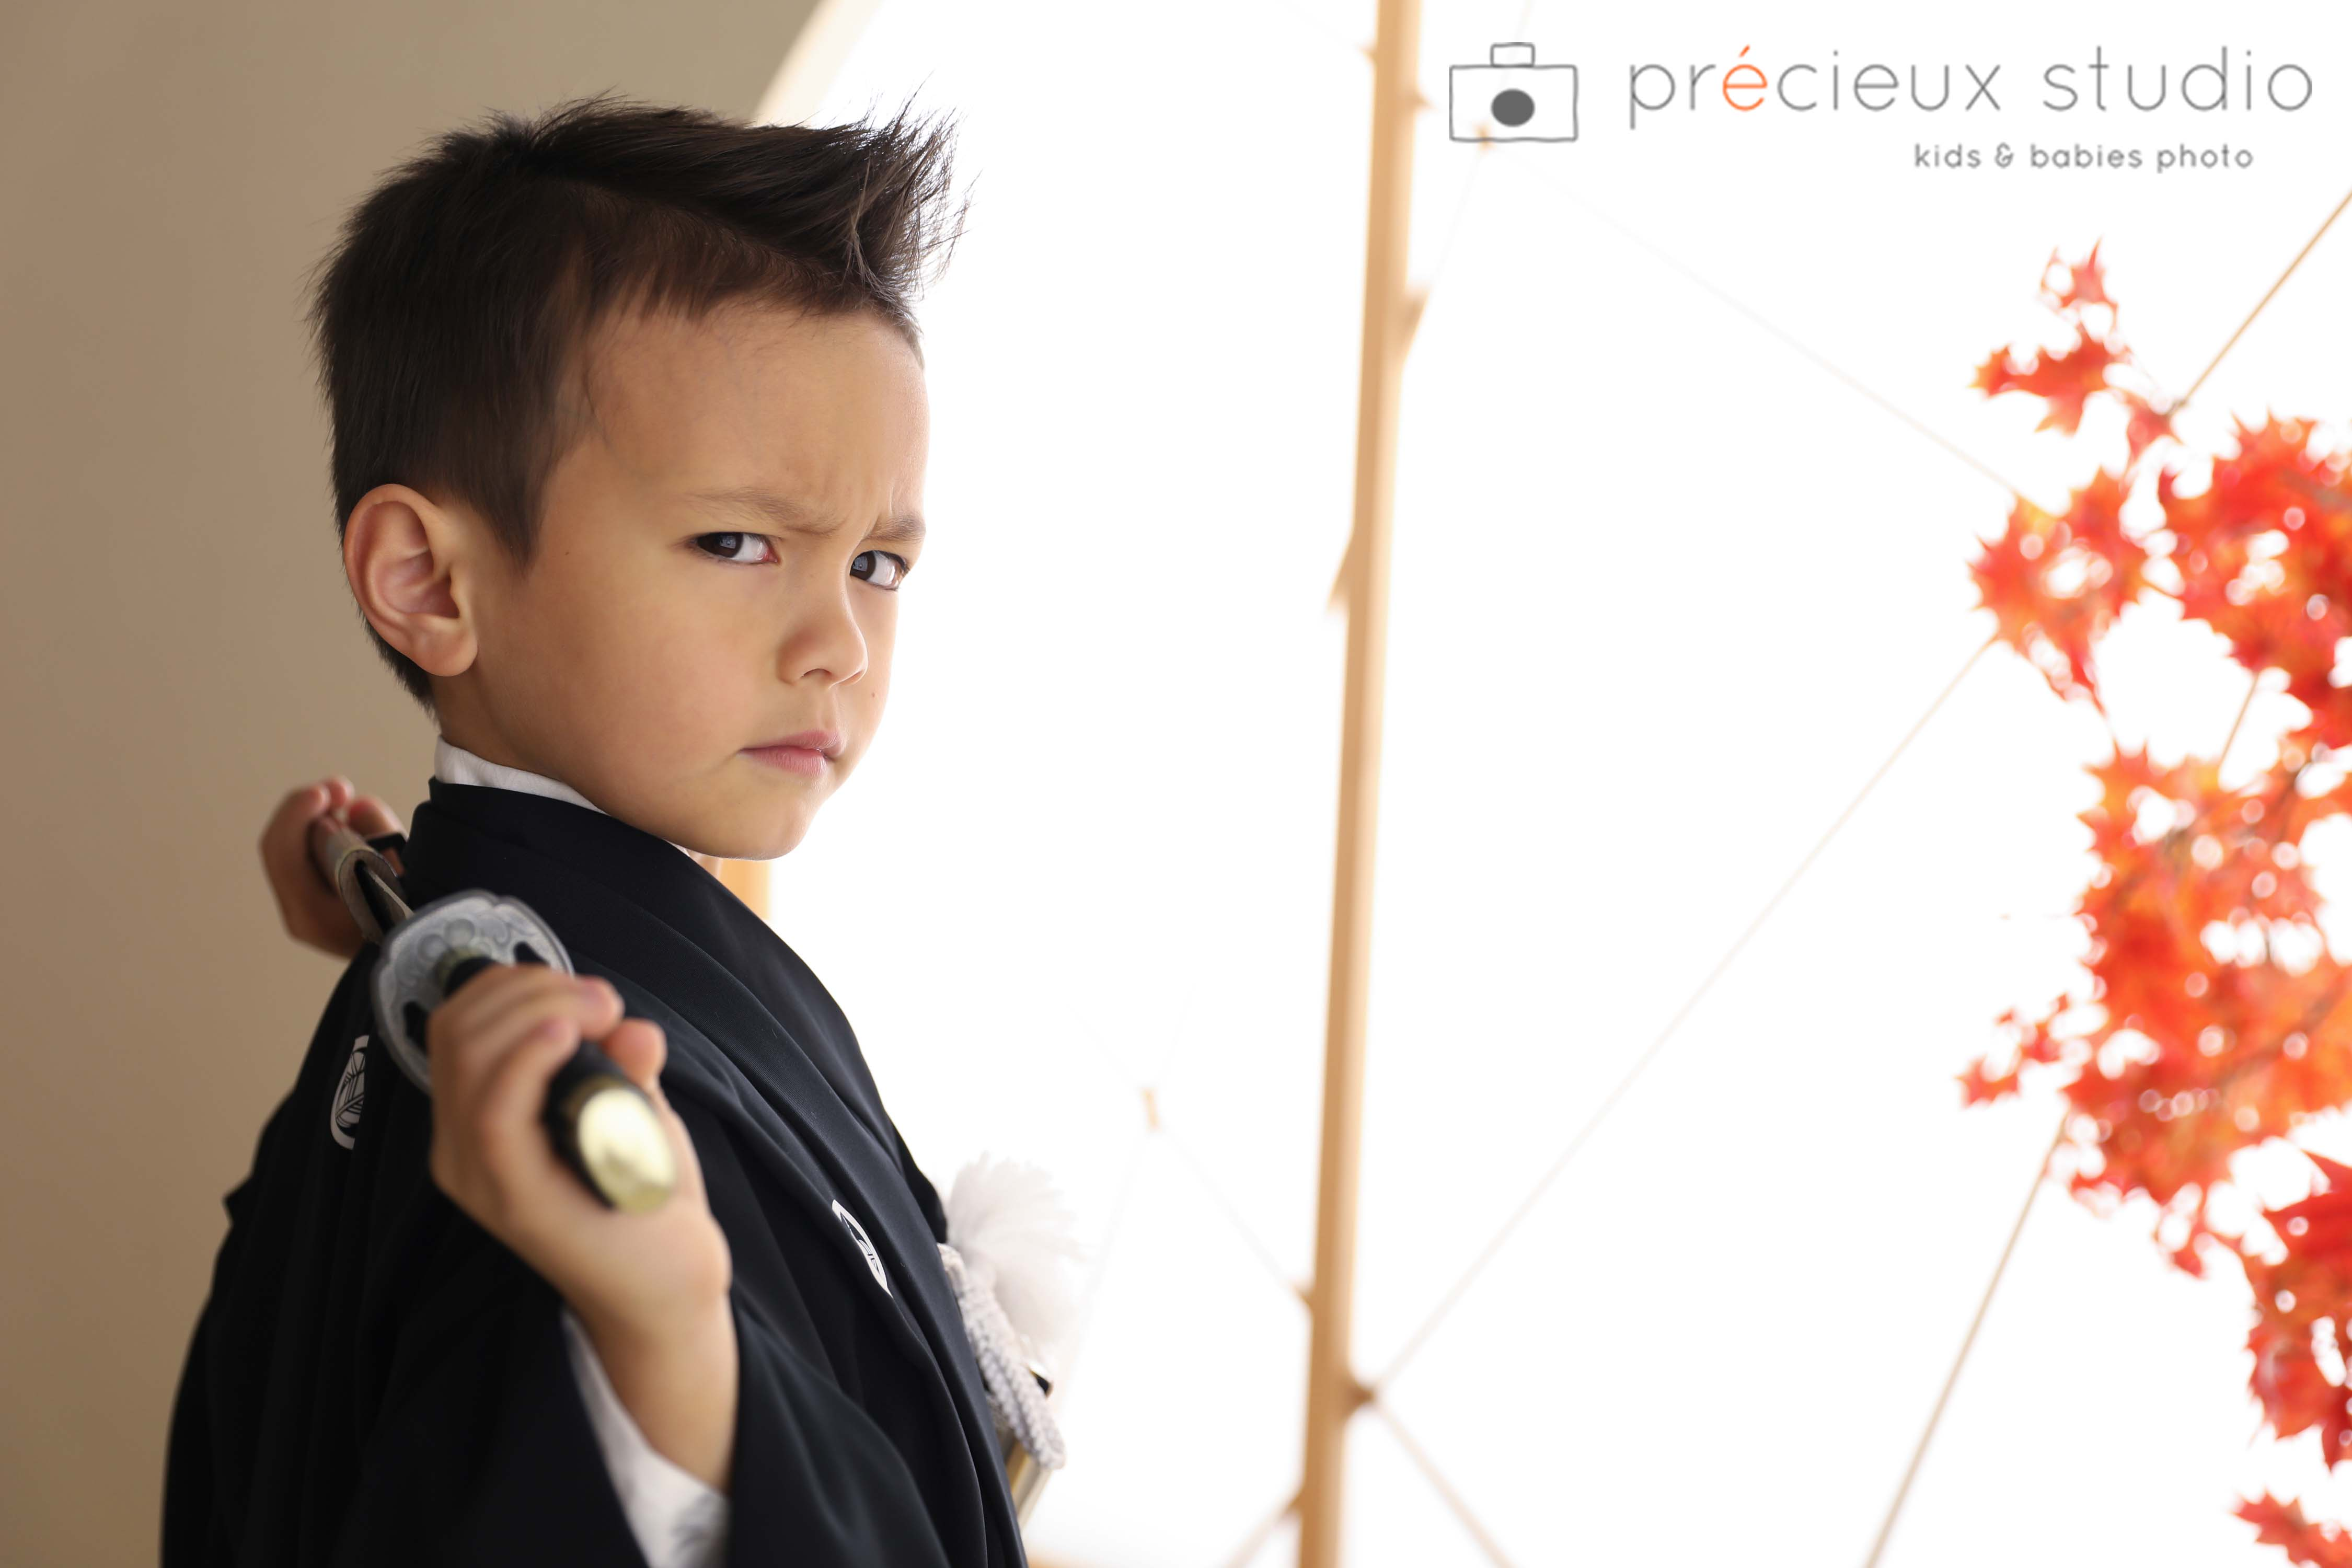 precieux_birthday_4